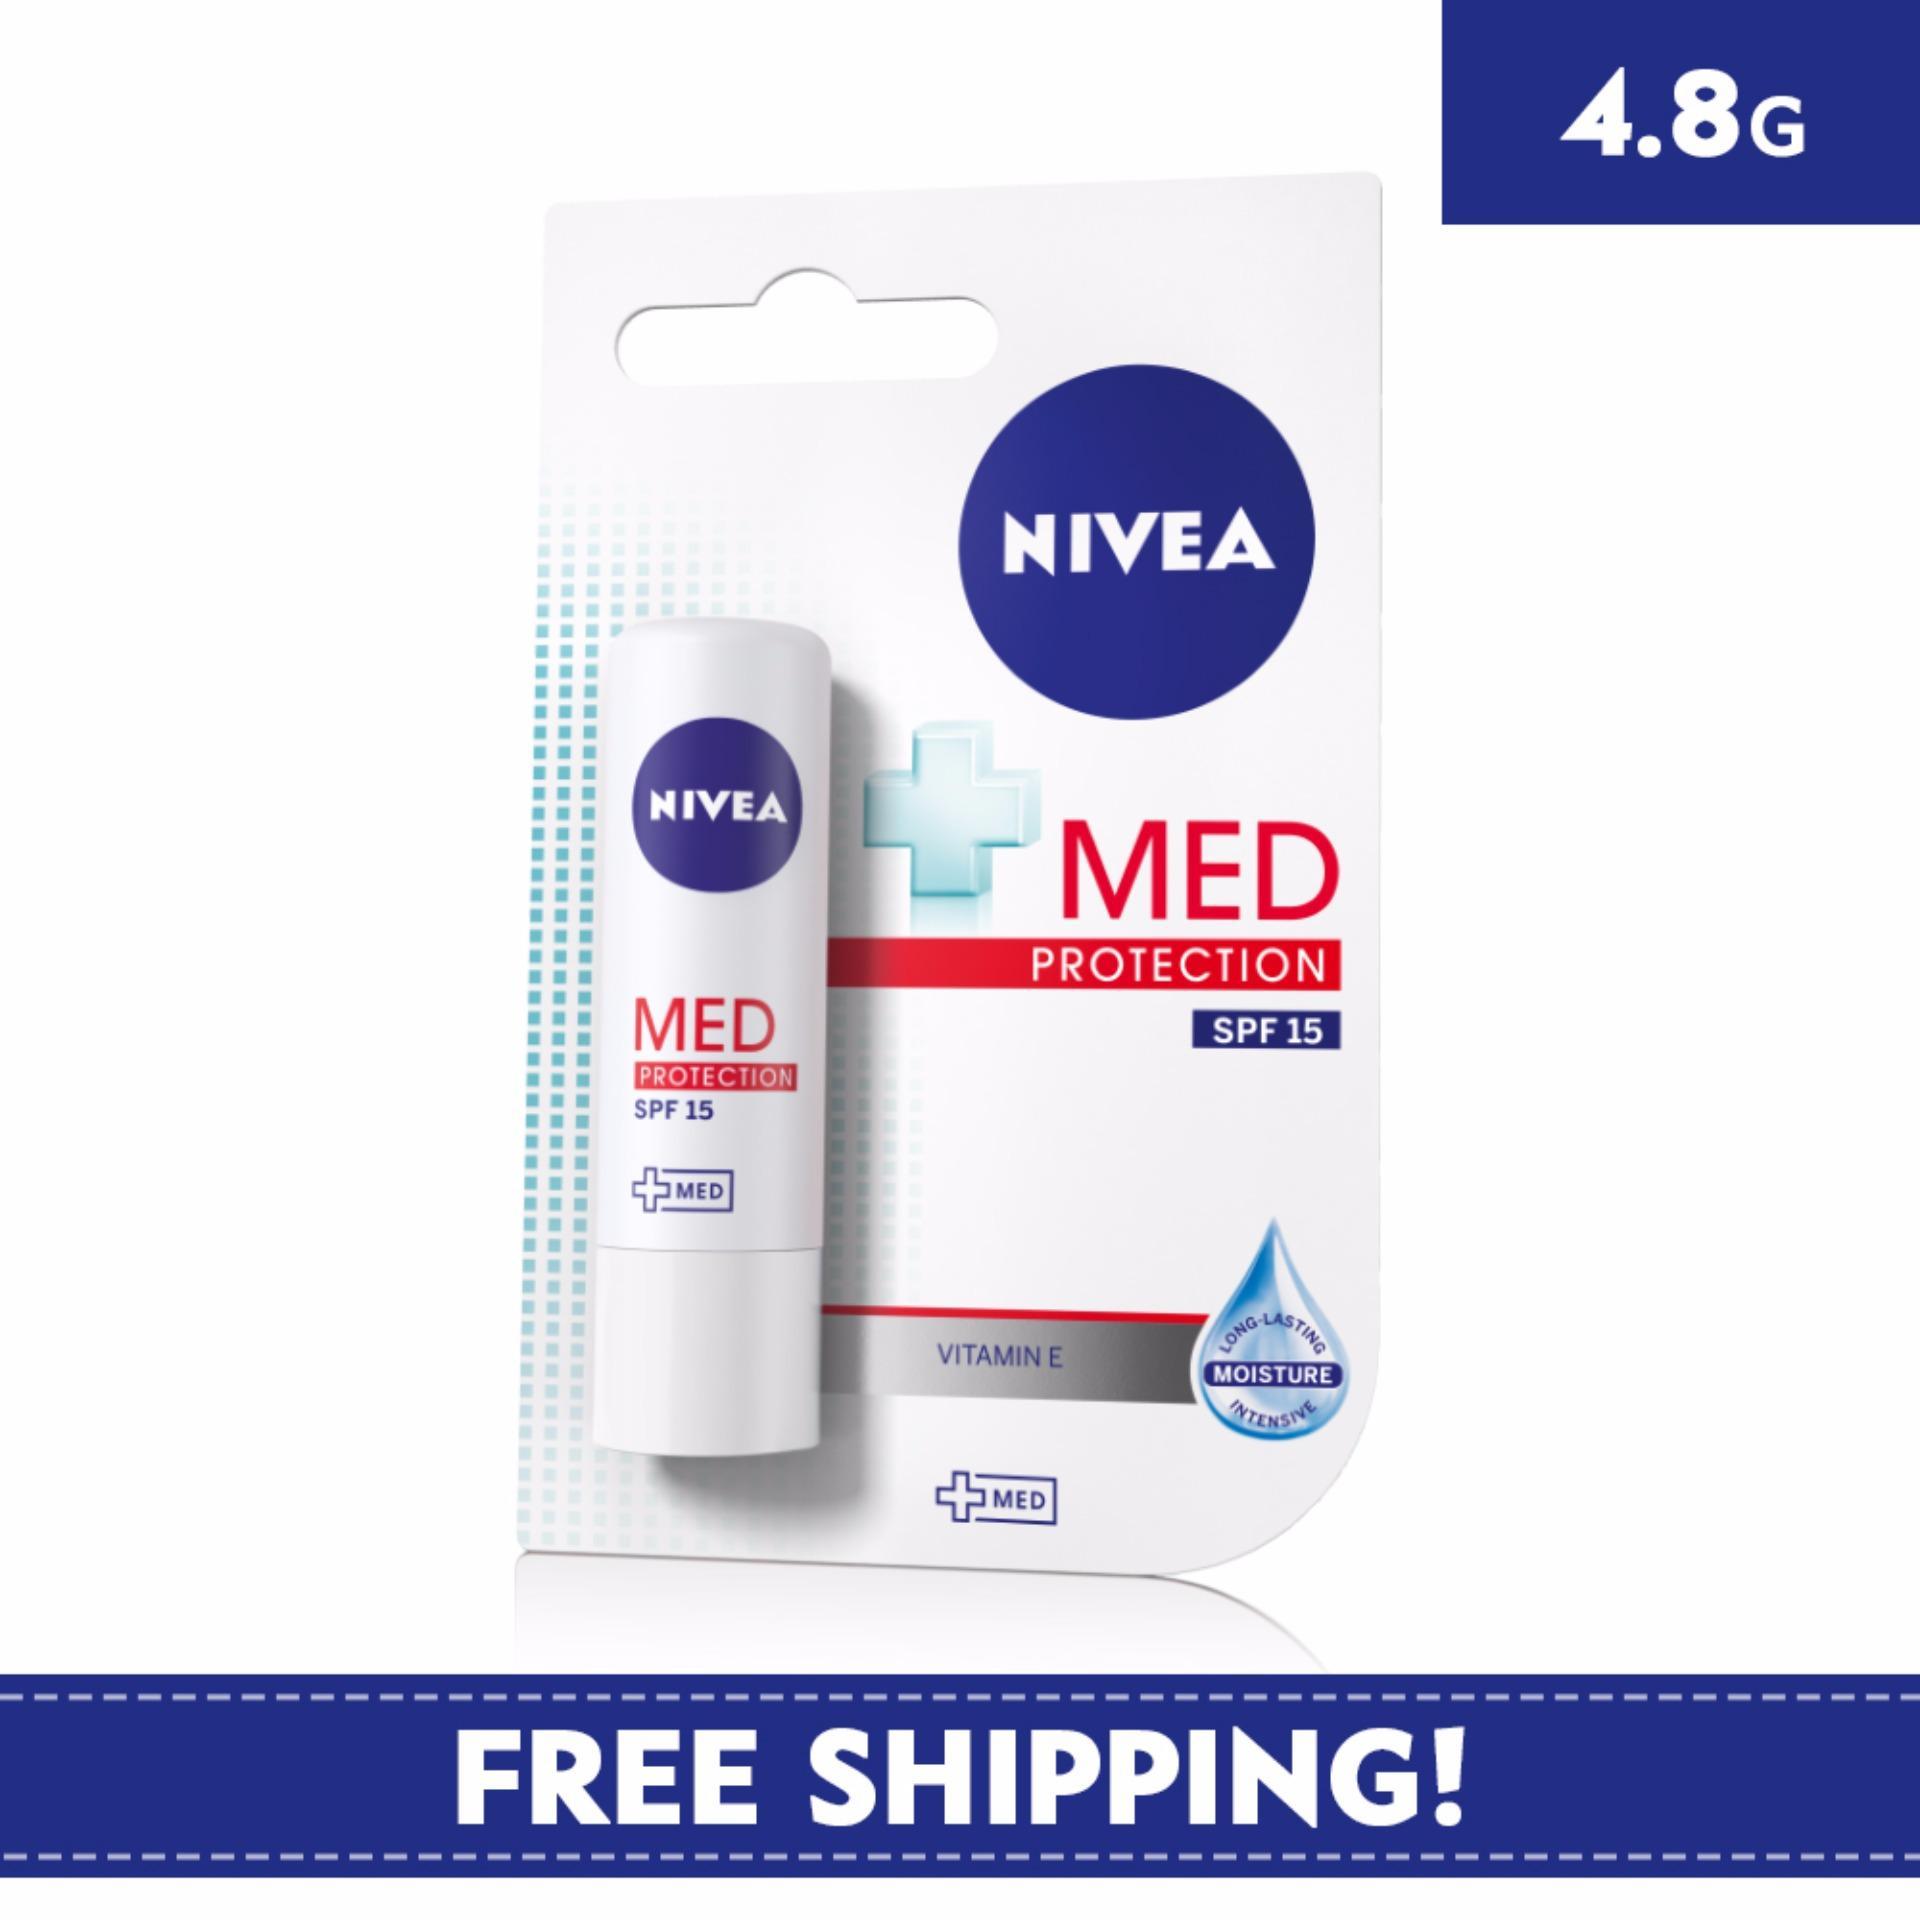 Buy Nivea Lip Care Unisex Spf 15 Med Protection 48g Singapore Balm